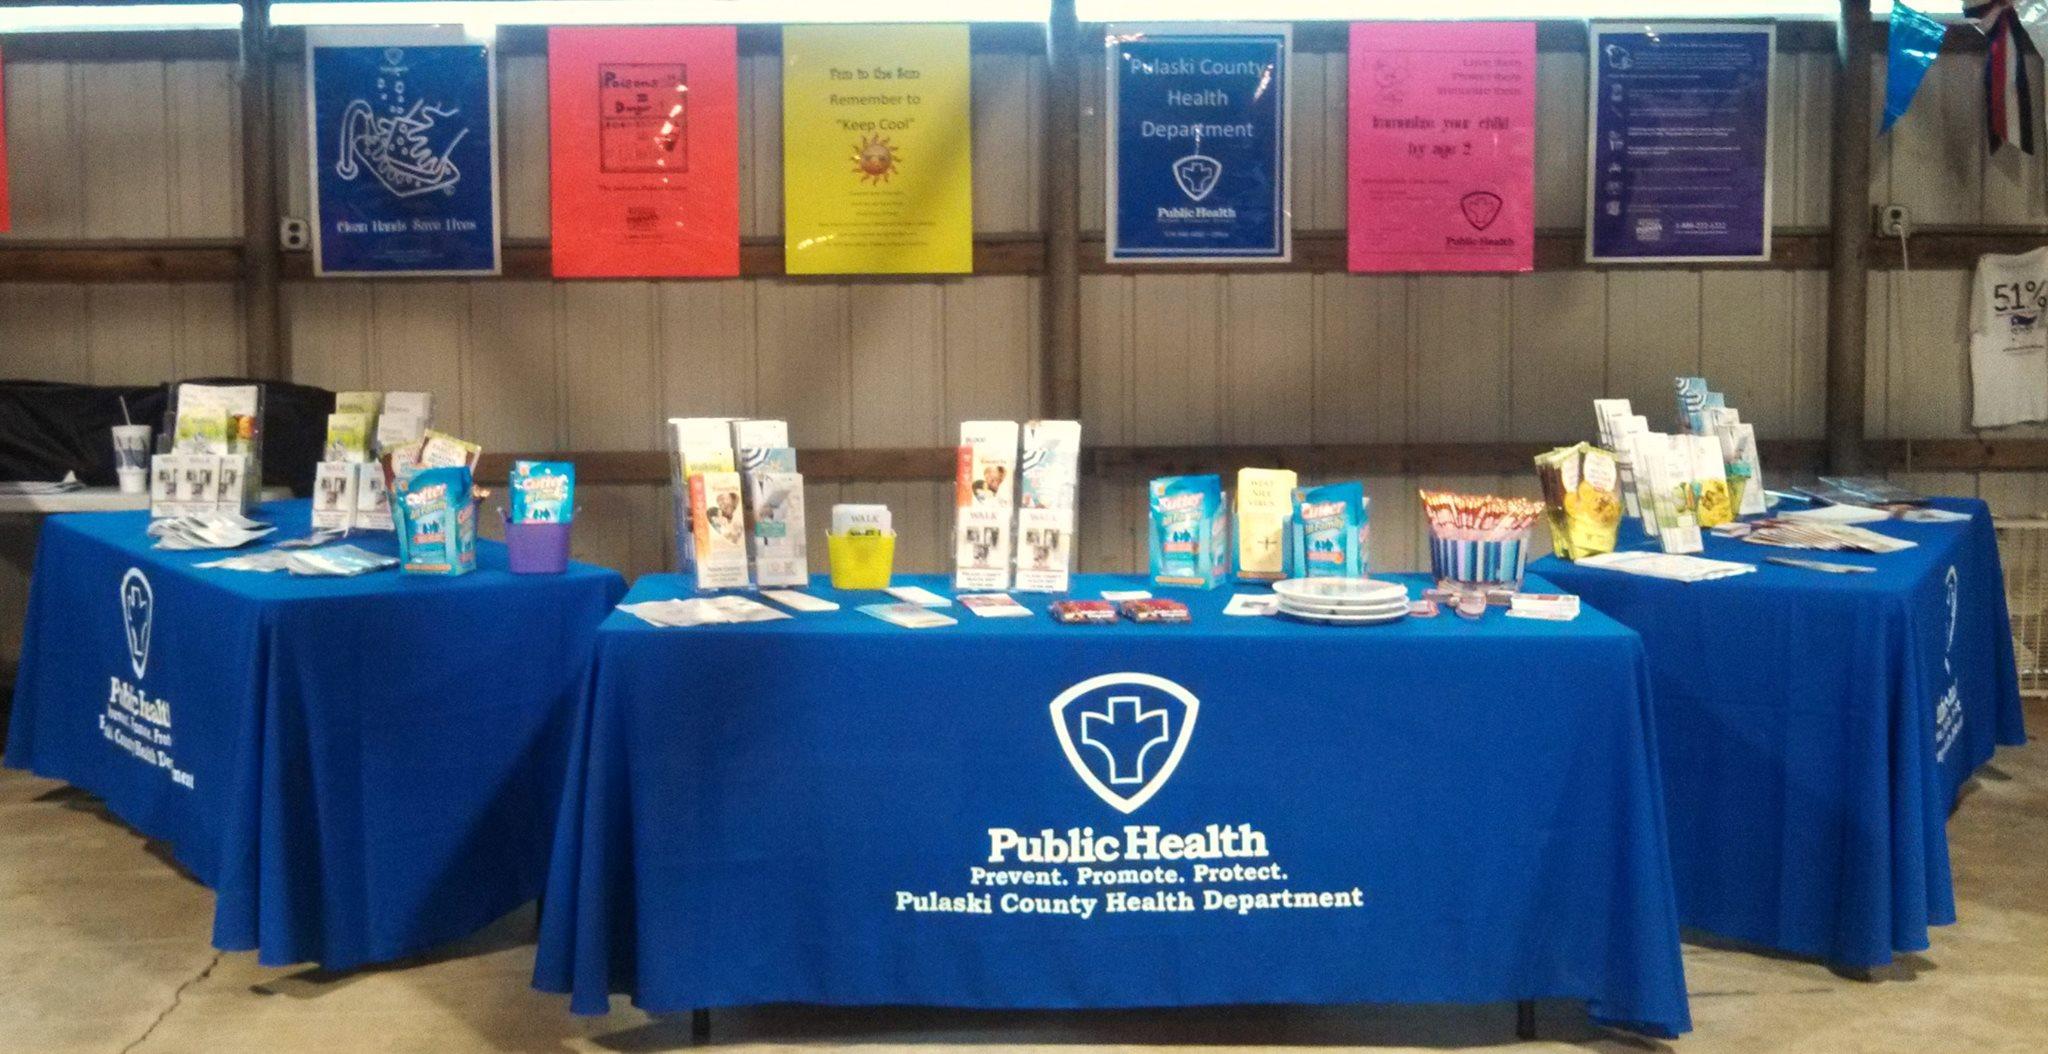 Health Department | Government | Pulaski Online